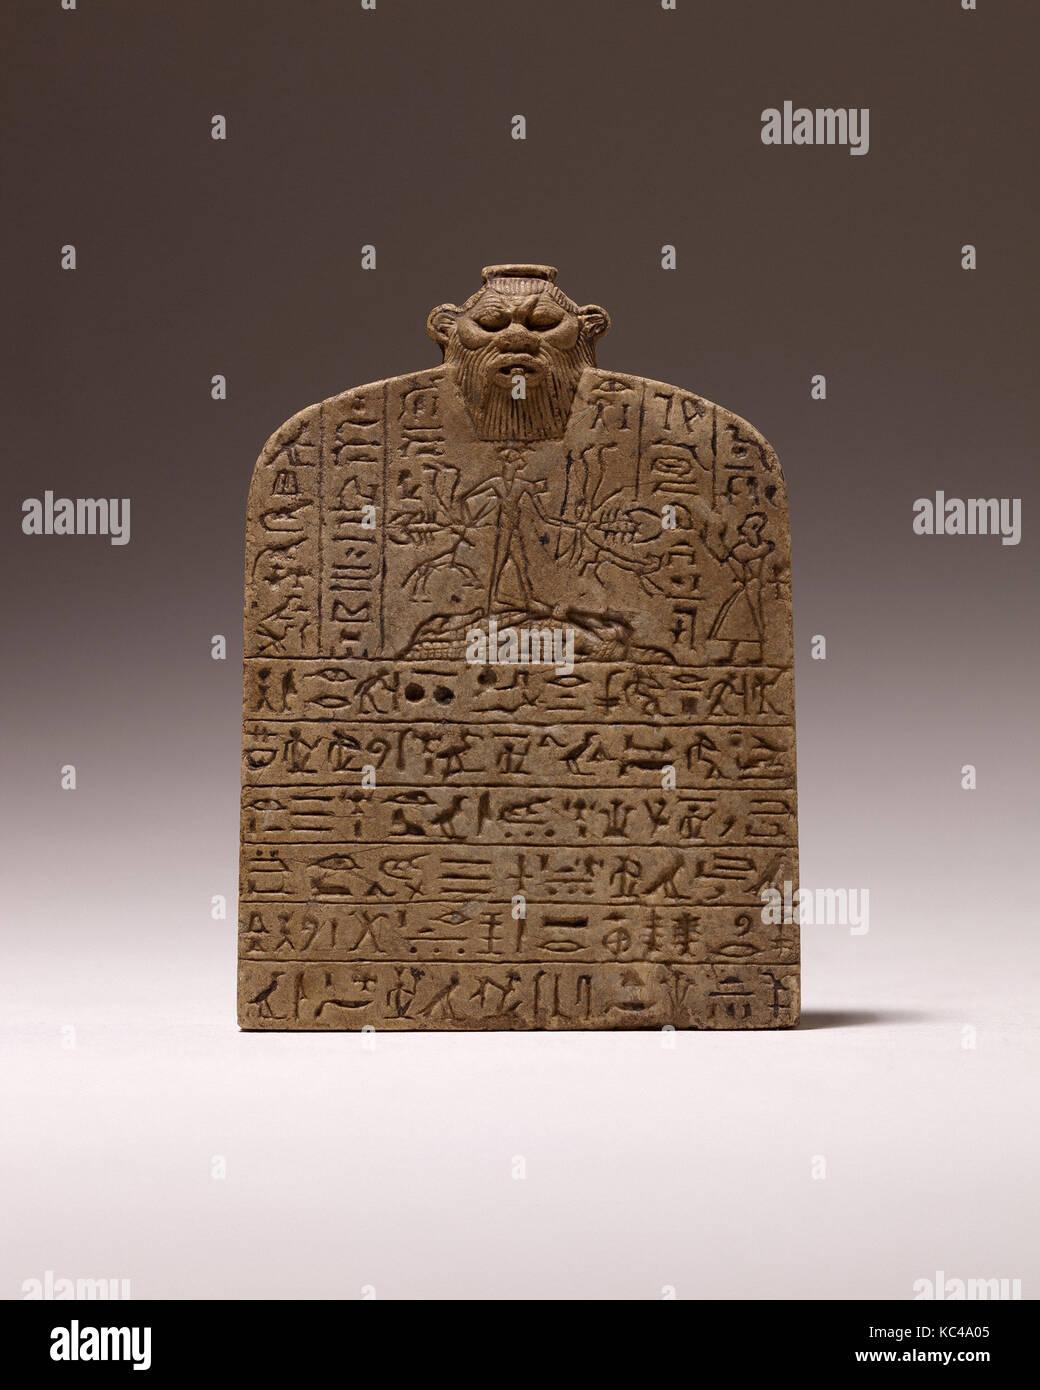 Small Magical Stela with Shed dedicated by Nesamenemopet, son of Djedkhonsuiufankh, ca. 750–664 B.C - Stock Image